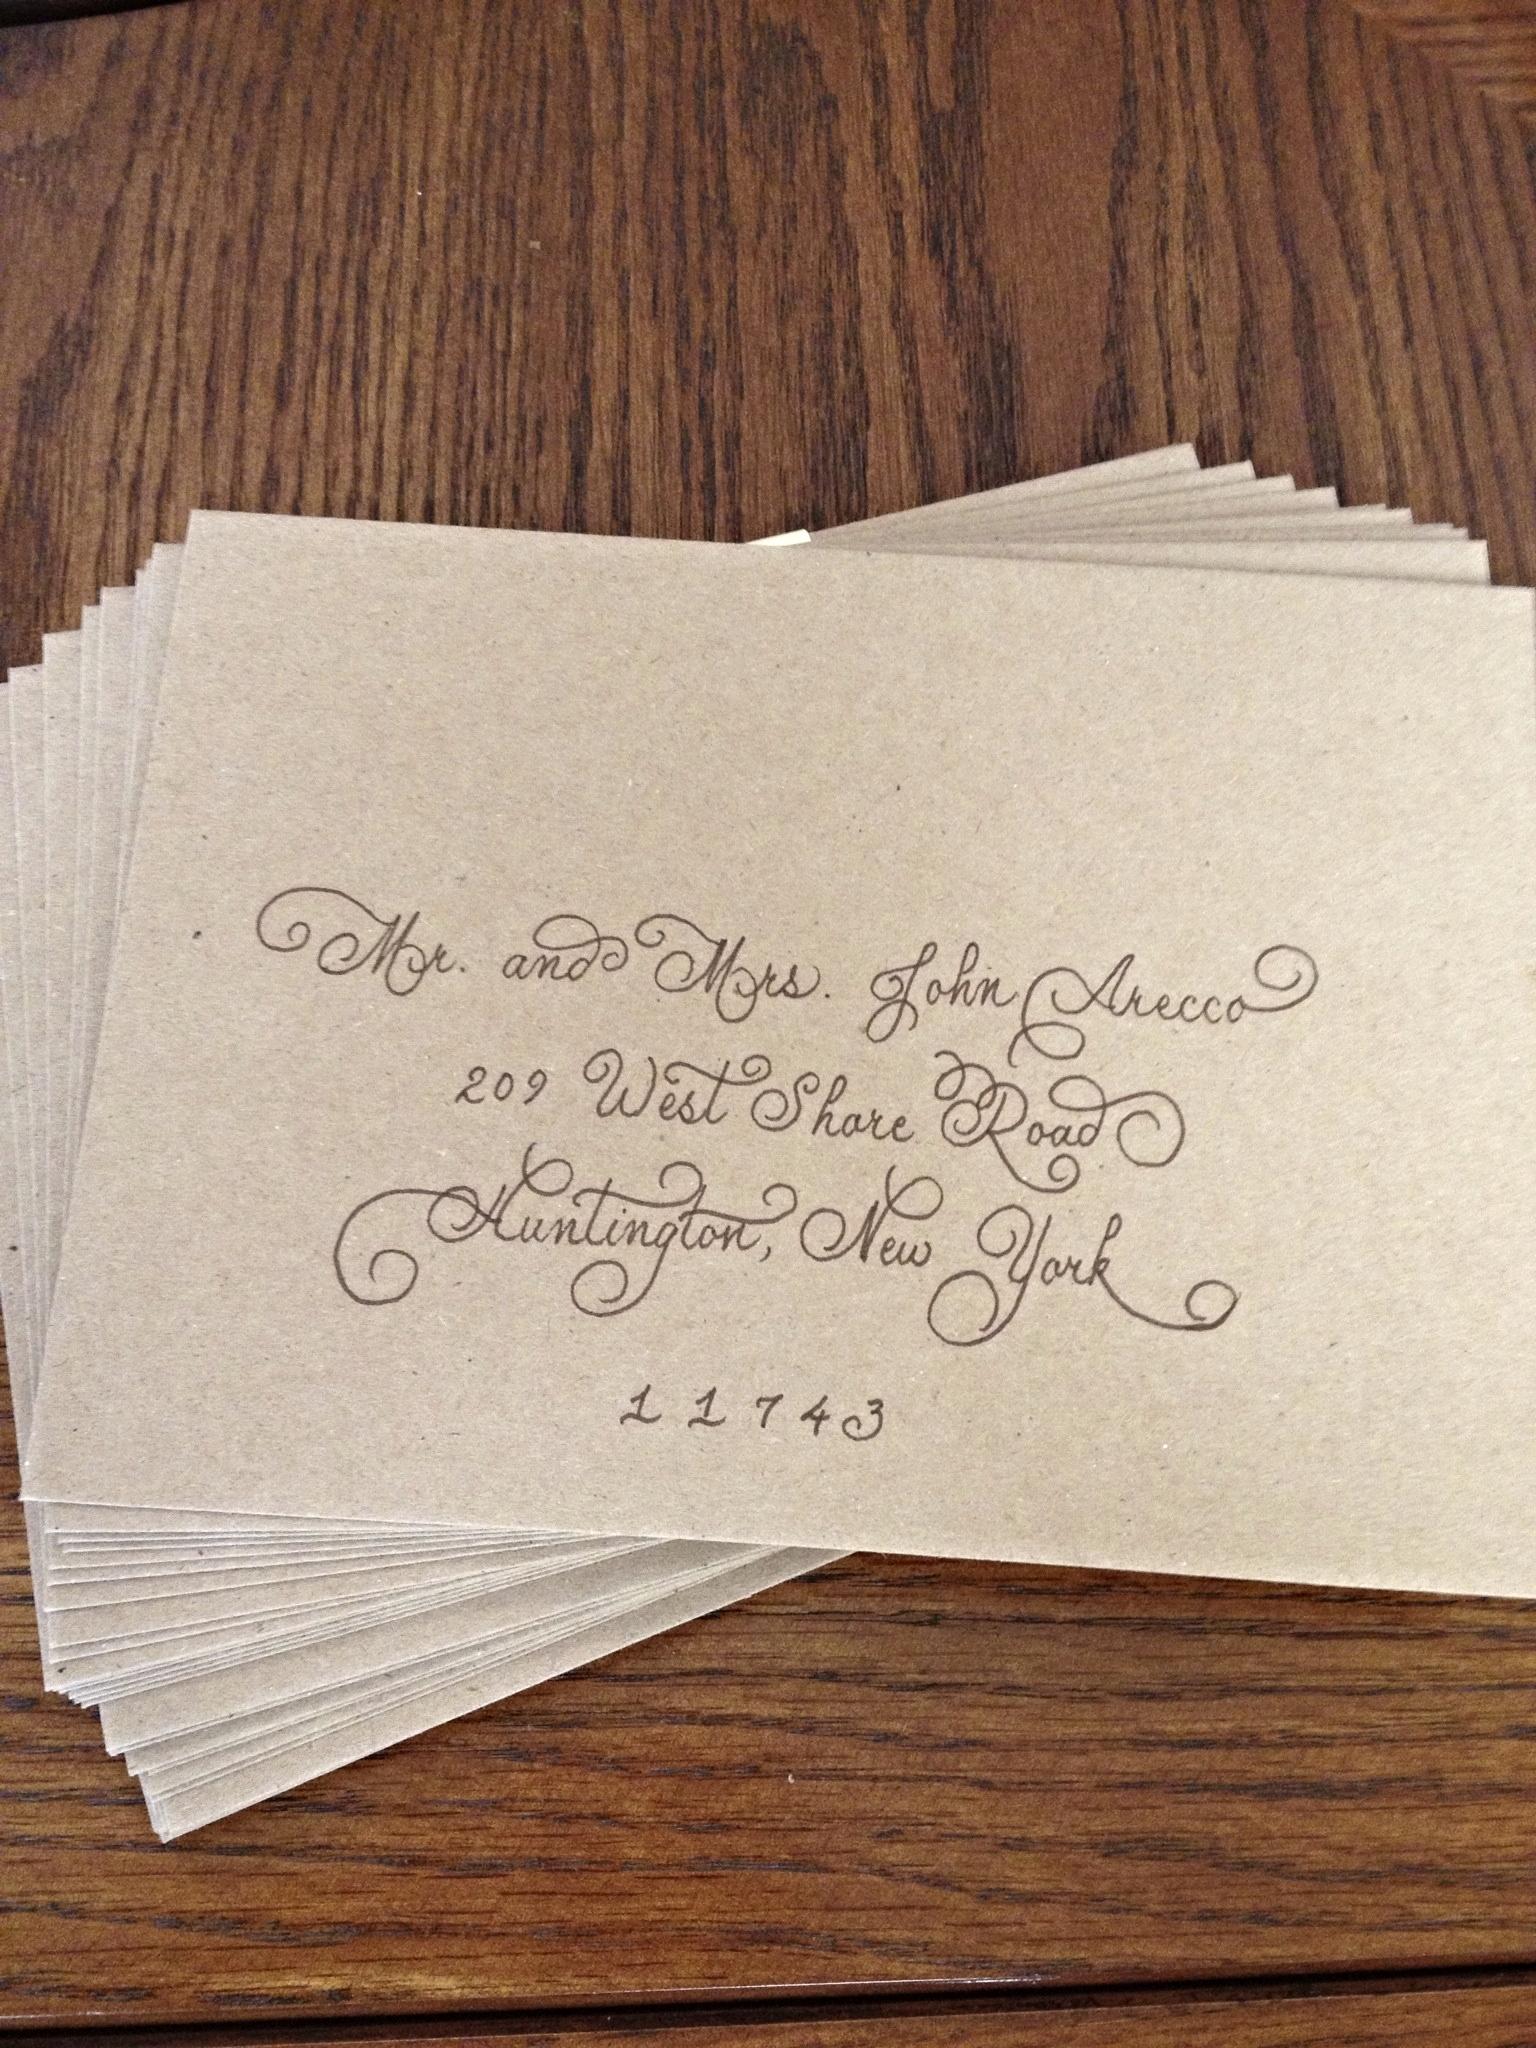 coldiron invitation font.jpg